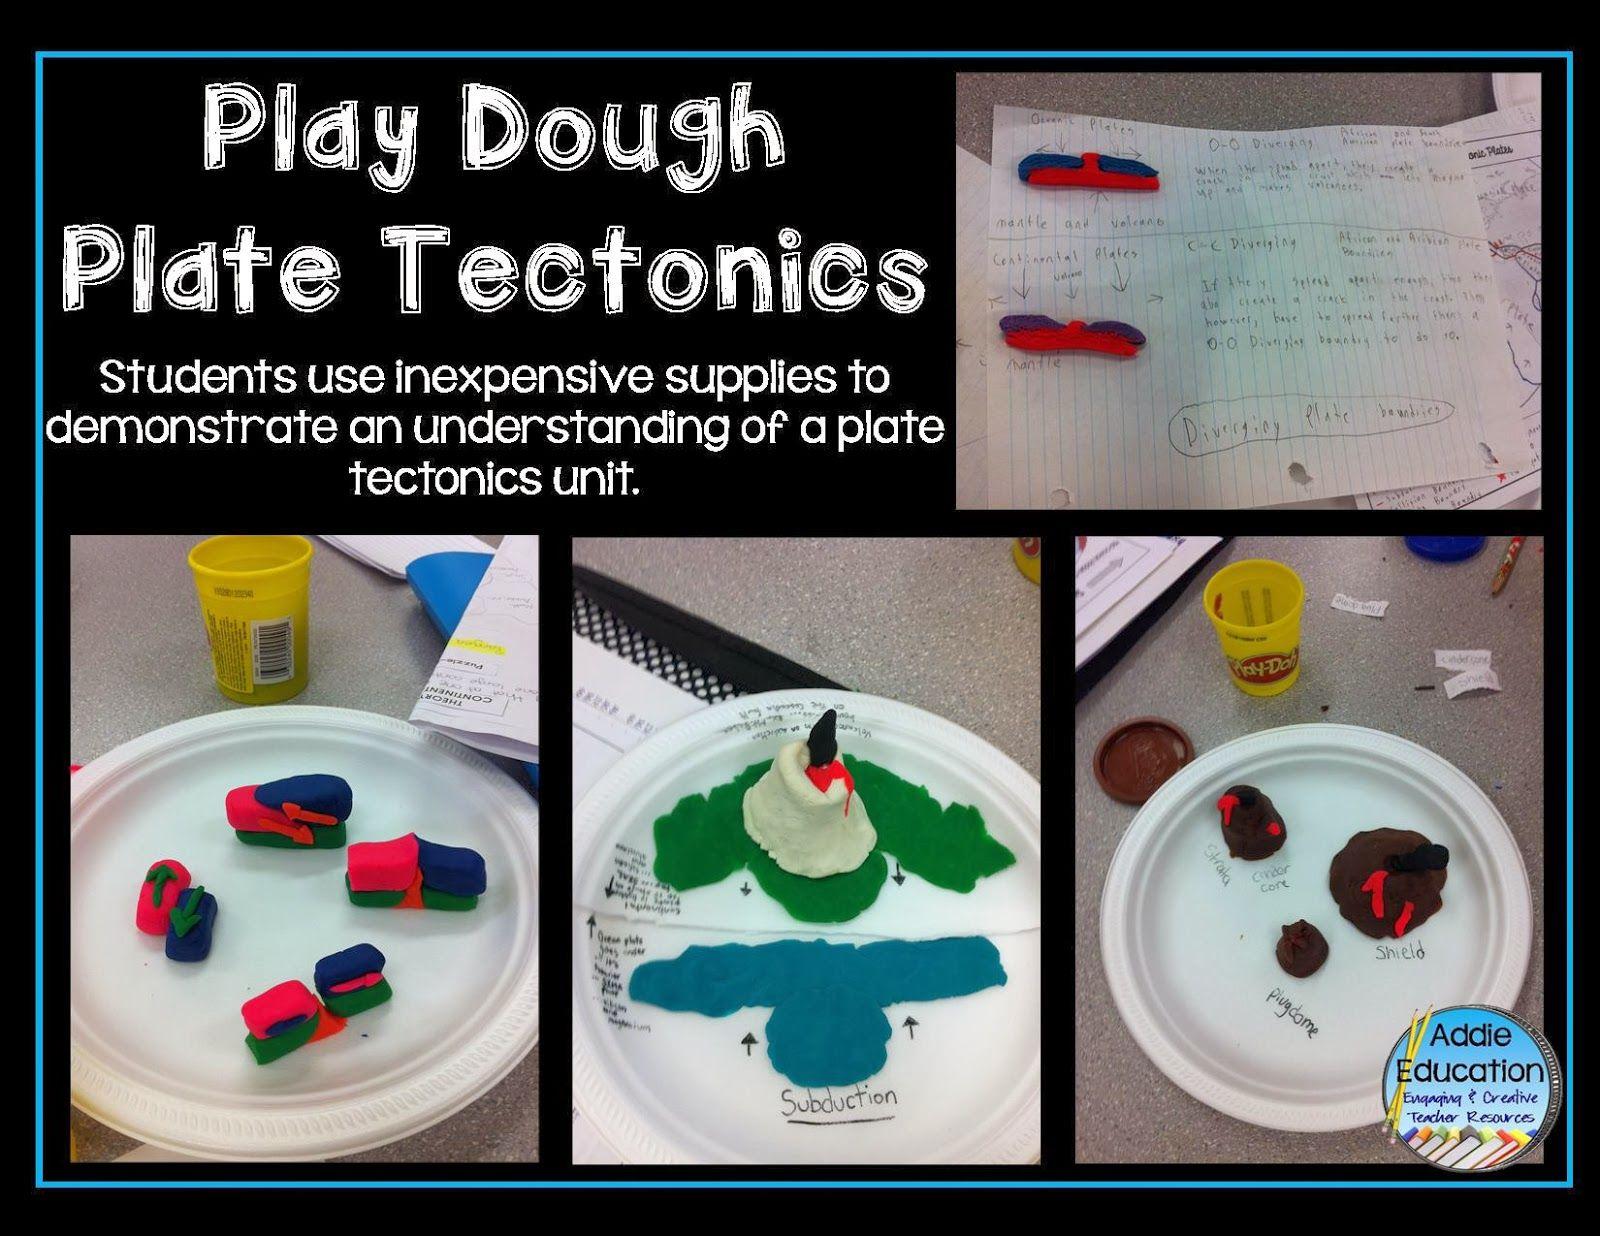 Plate Tectonics With Play Dough